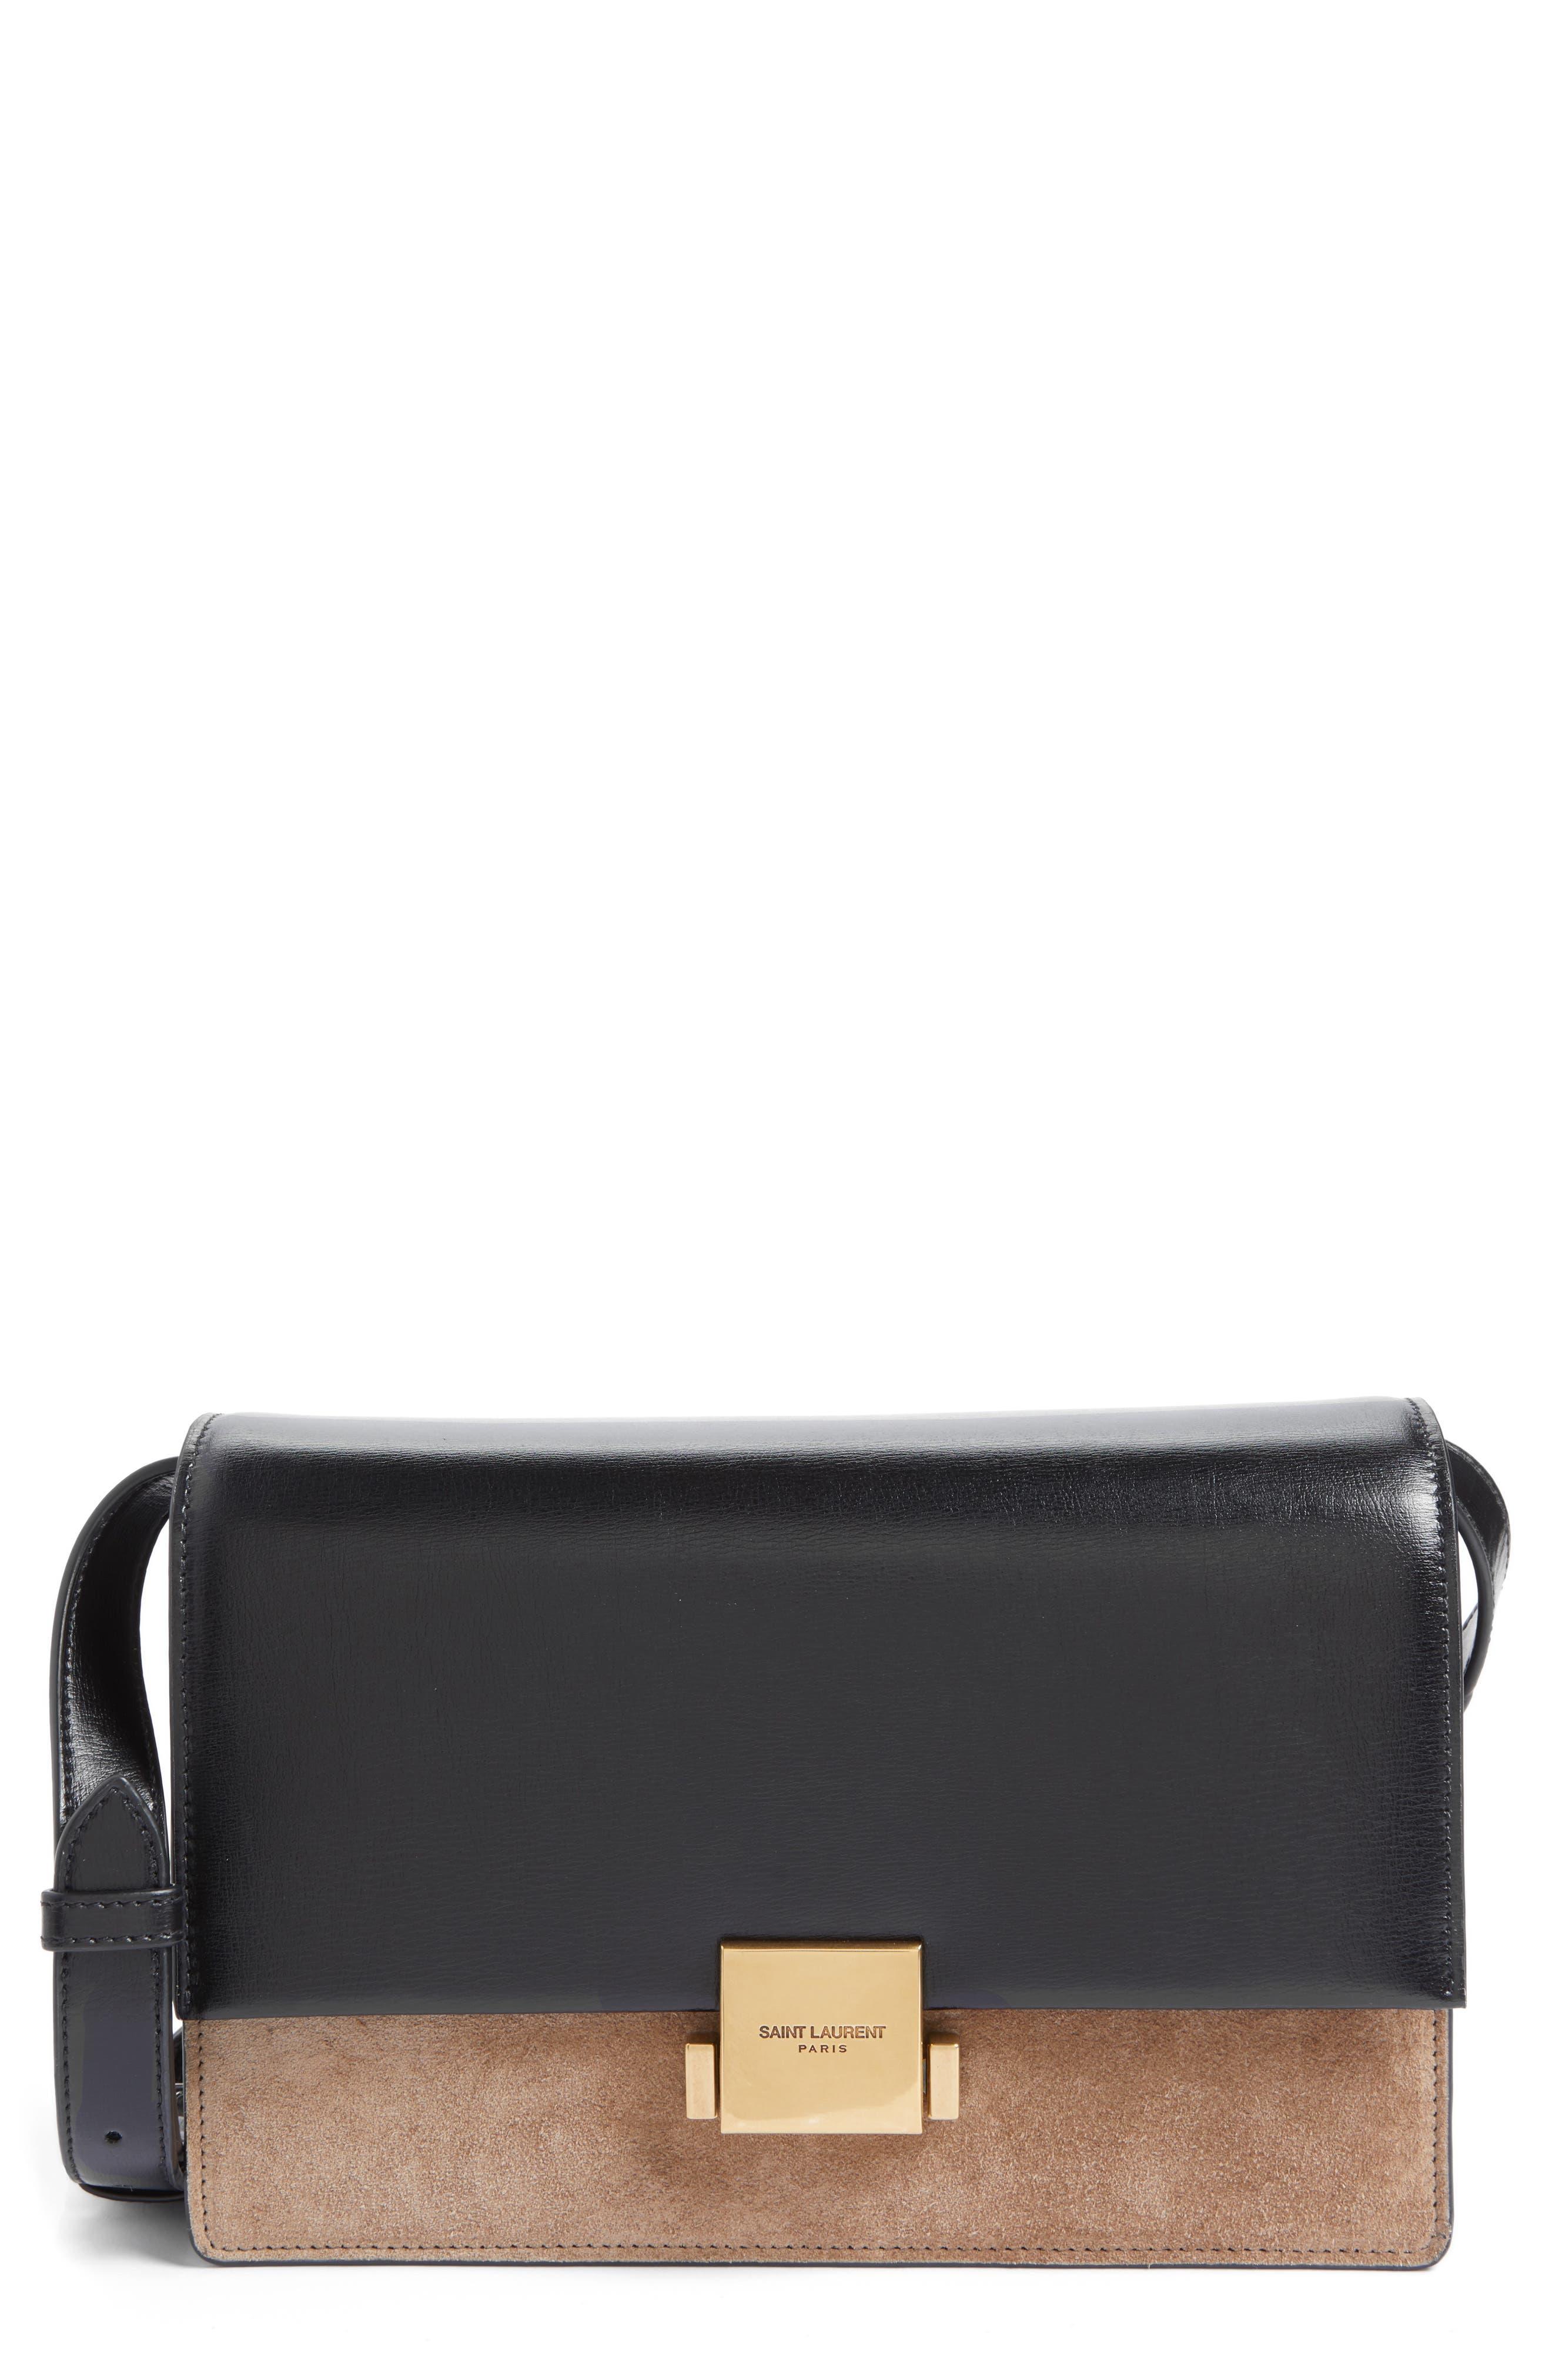 Main Image - Saint Laurent Medium Bellechasse Suede & Leather Shoulder Bag